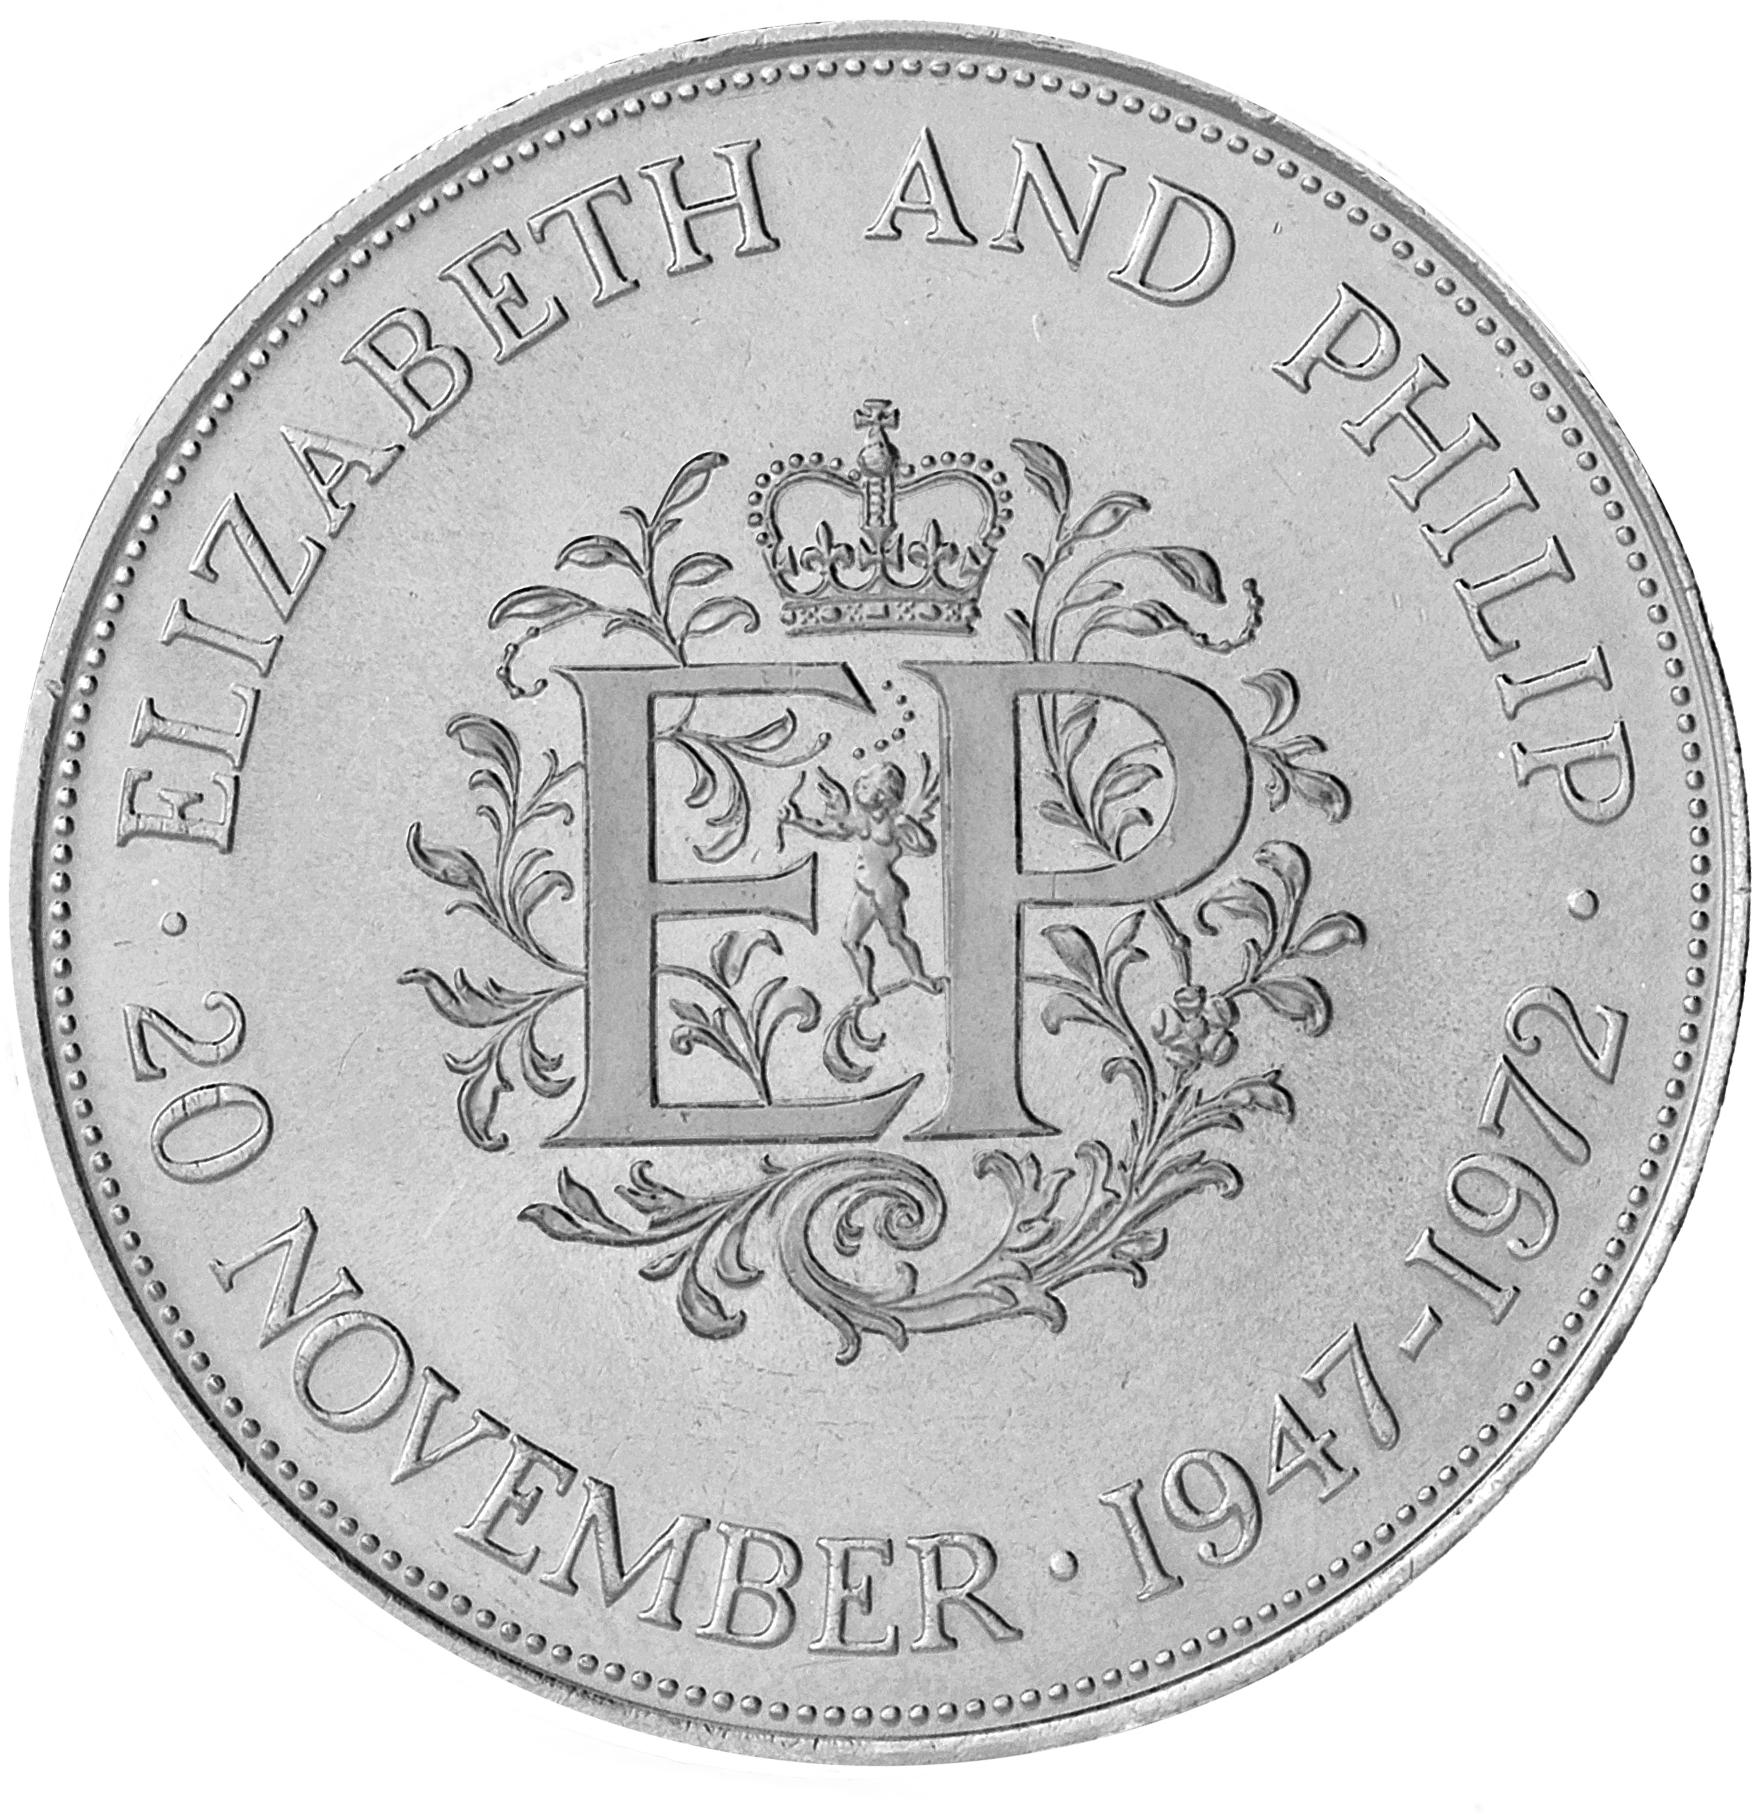 25 Pence The Unknown Denomination Change Checker